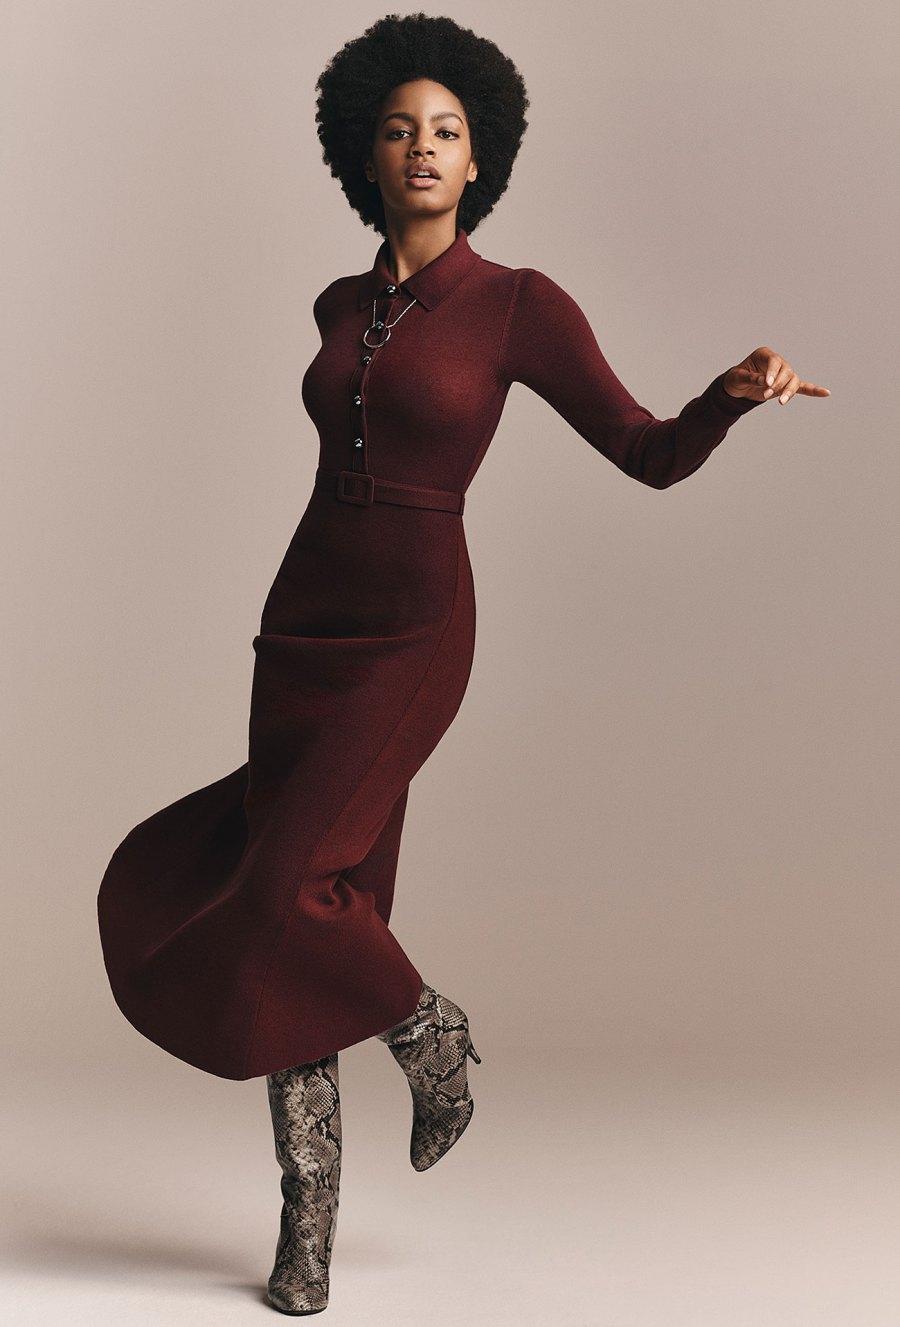 Zendaya x Tommy Hilfiger Collection - Zendaya Long Sleeve Midi Dress